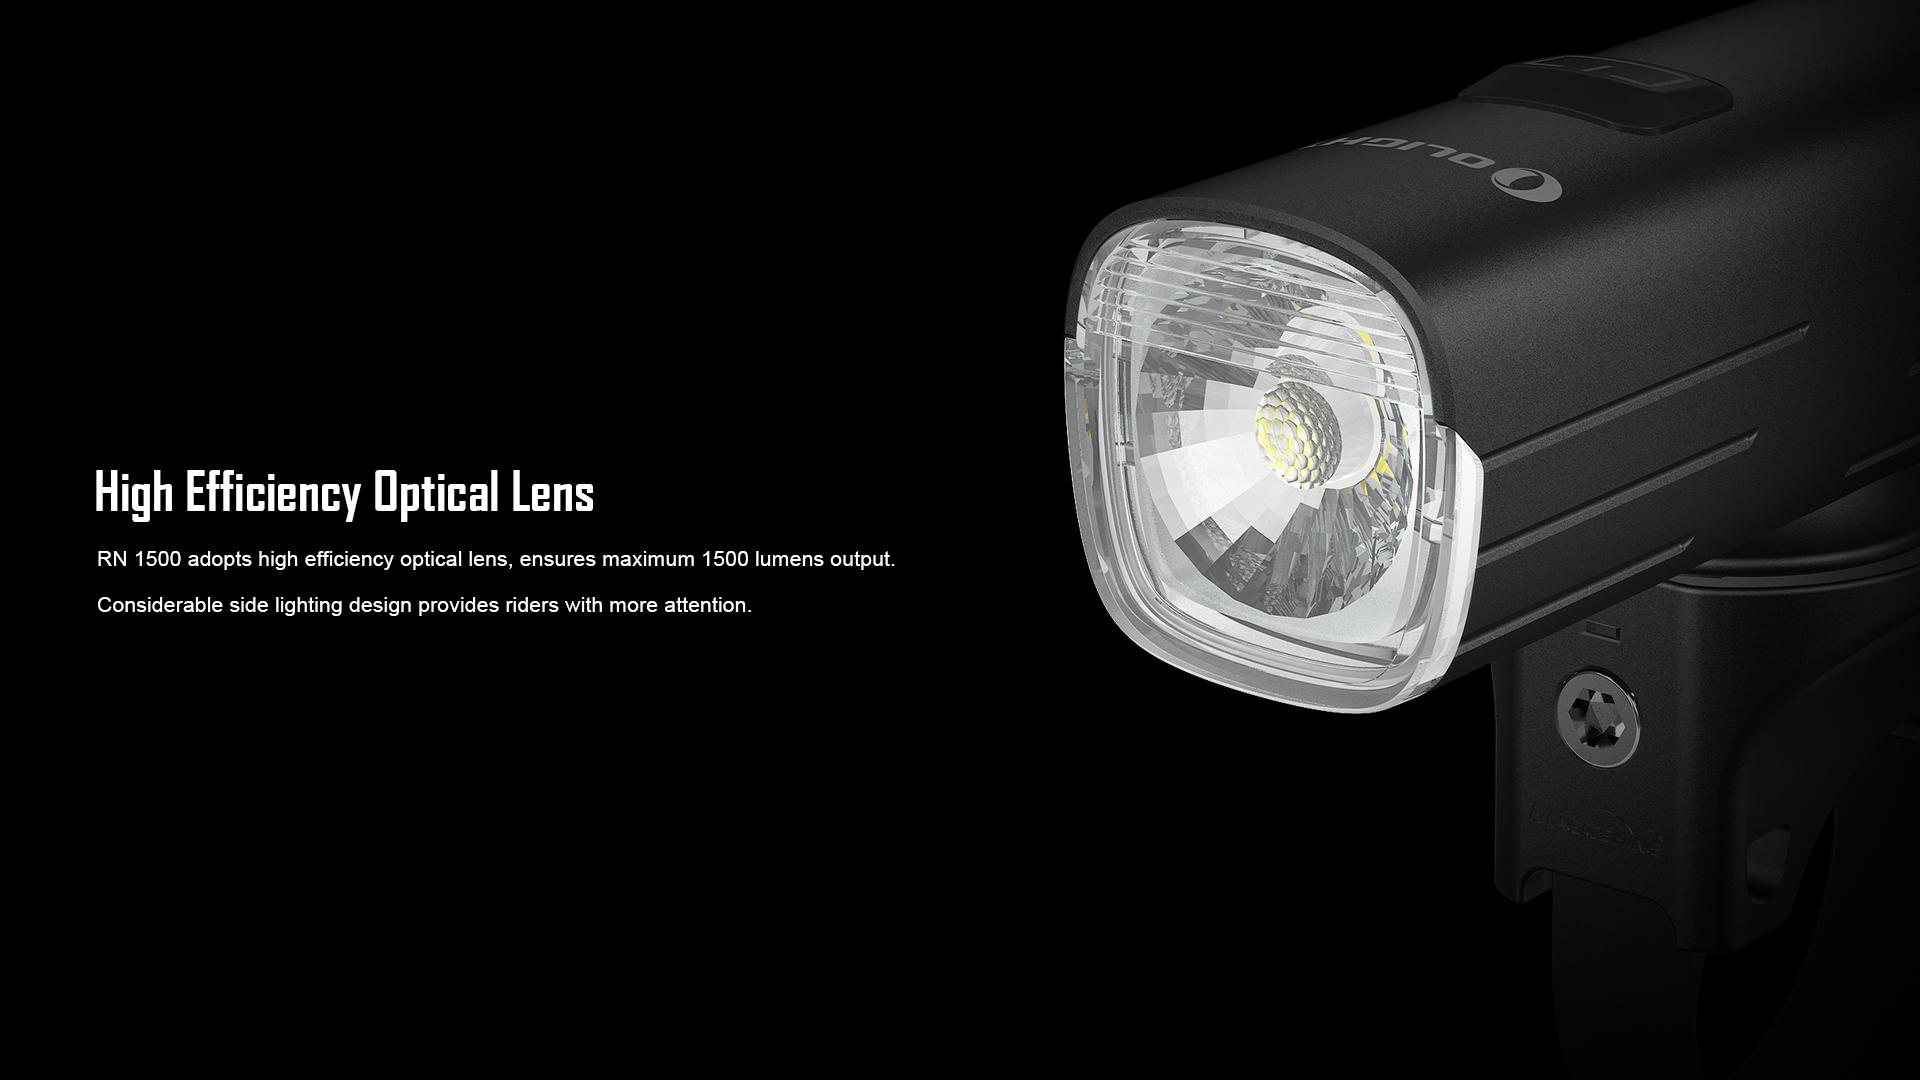 RN1500 Bike Headlight High Efficiency